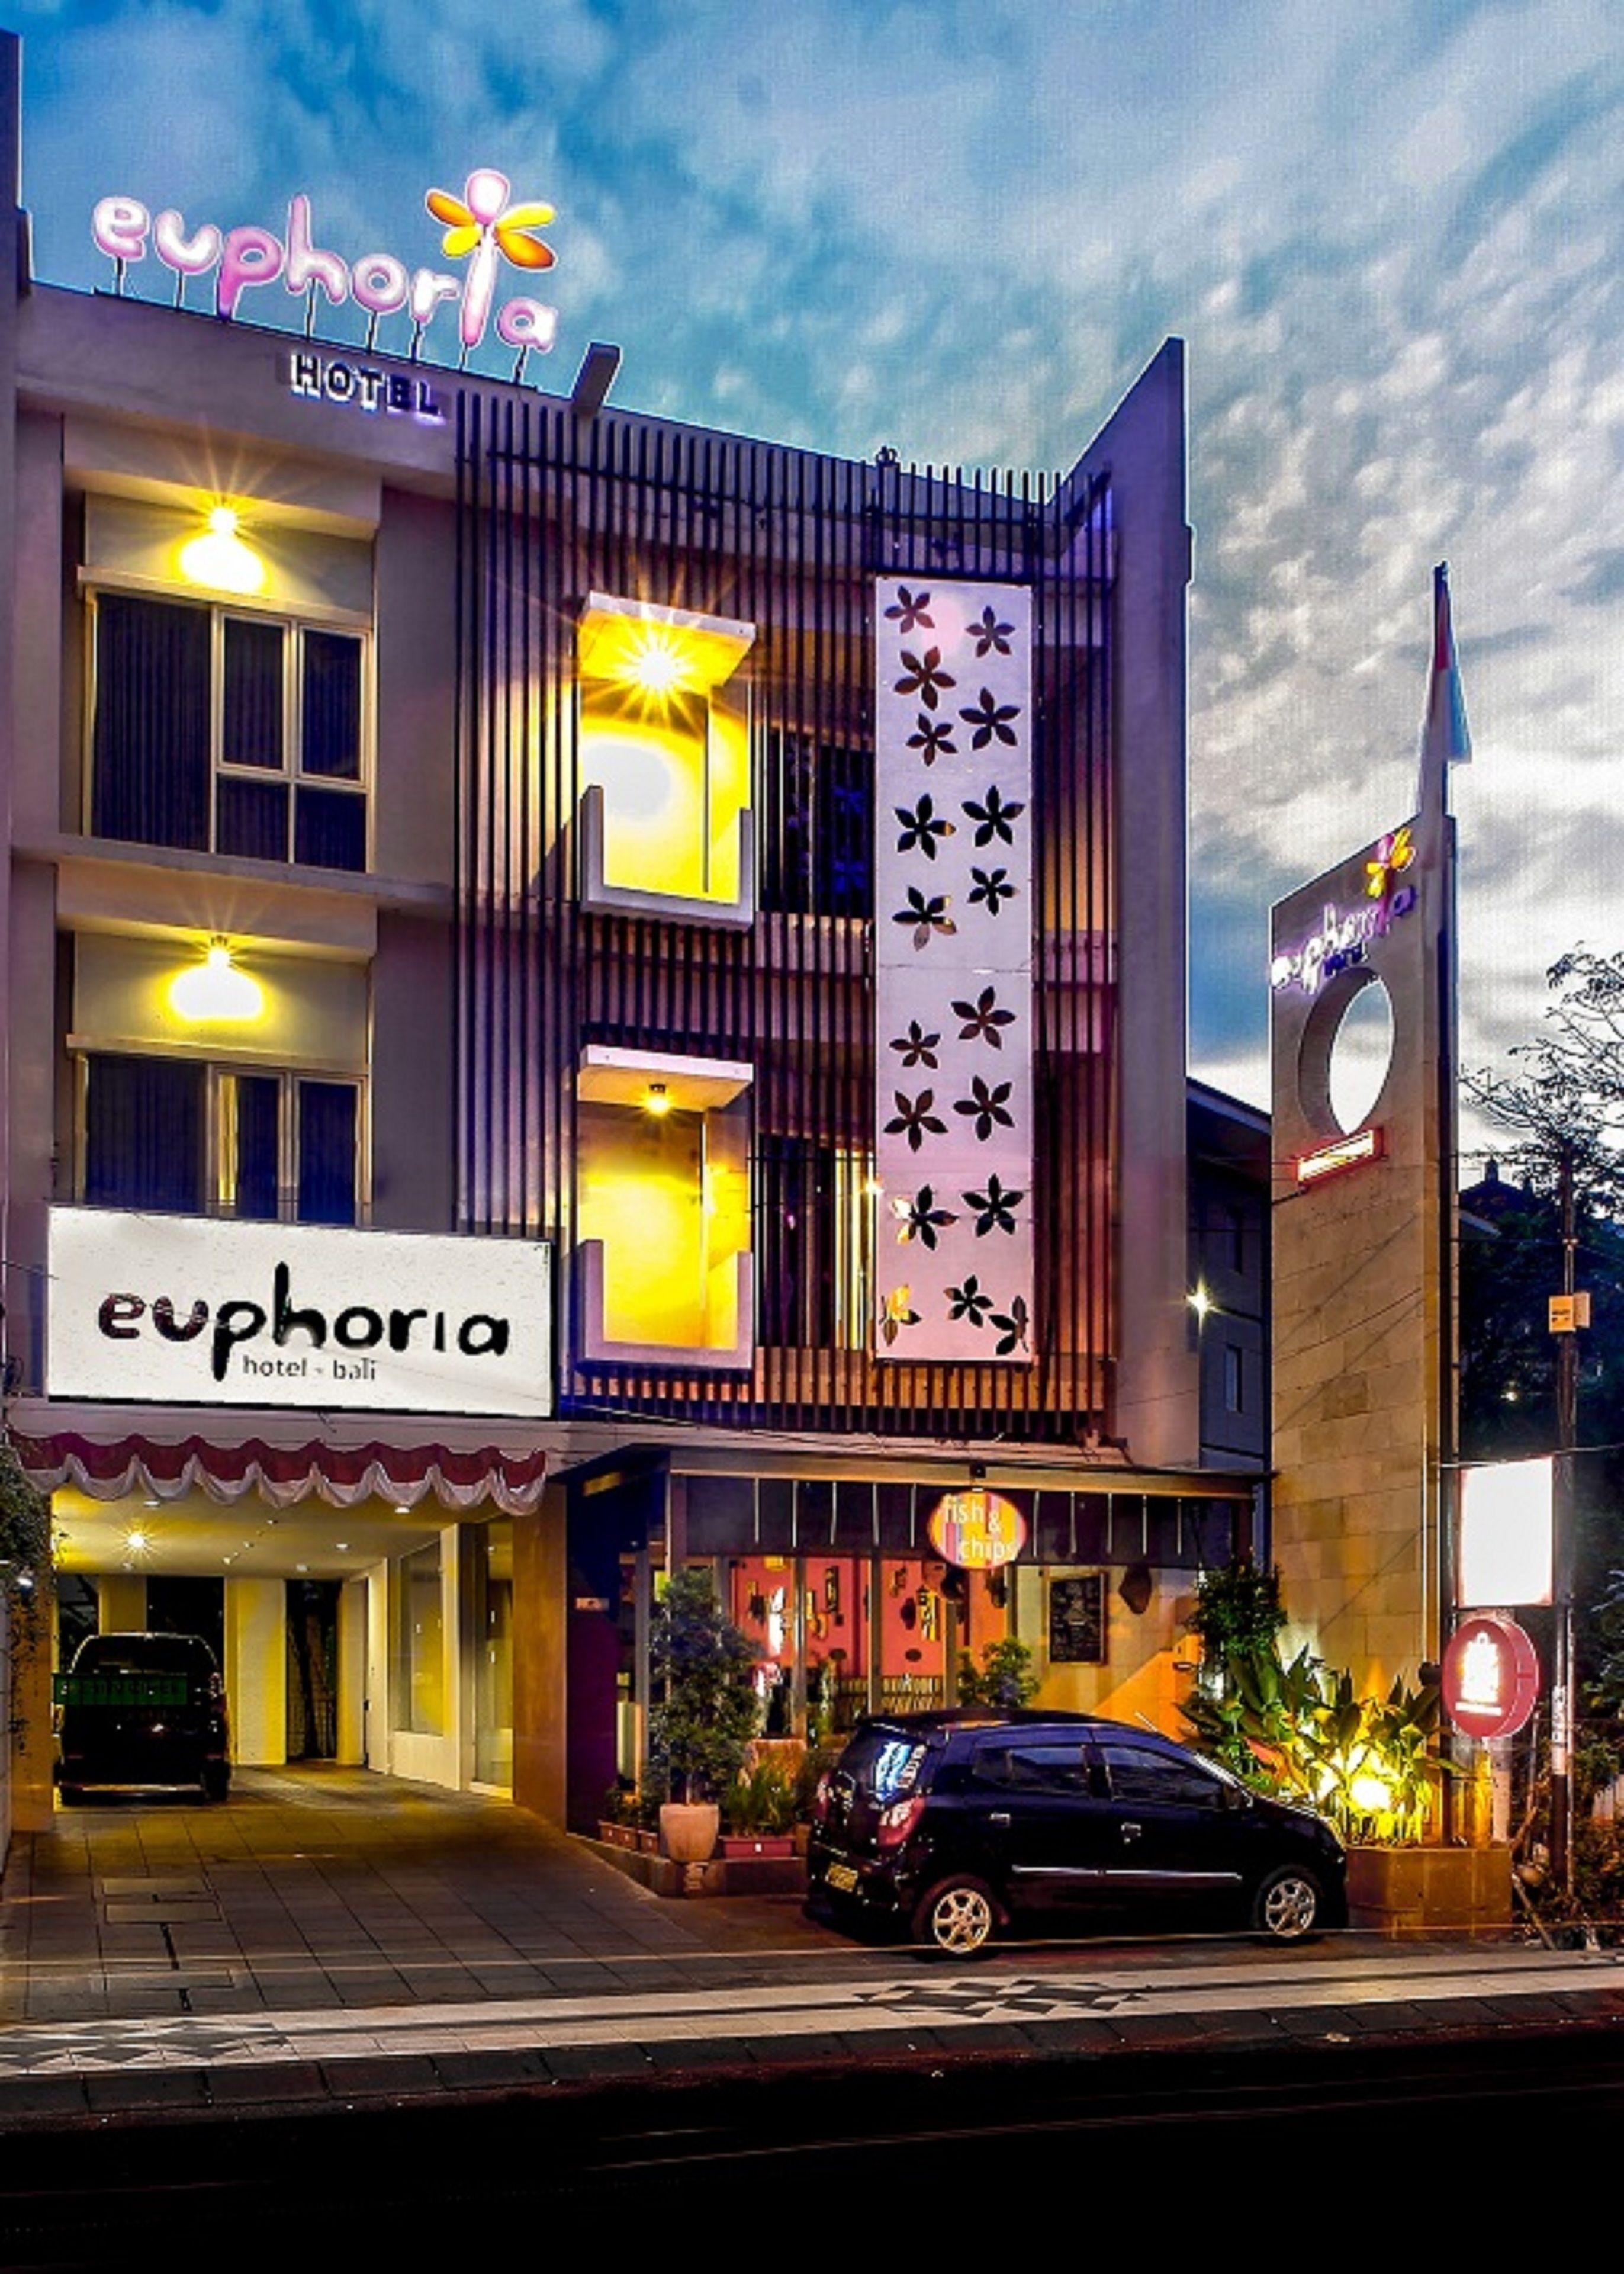 Euphoria Hotel